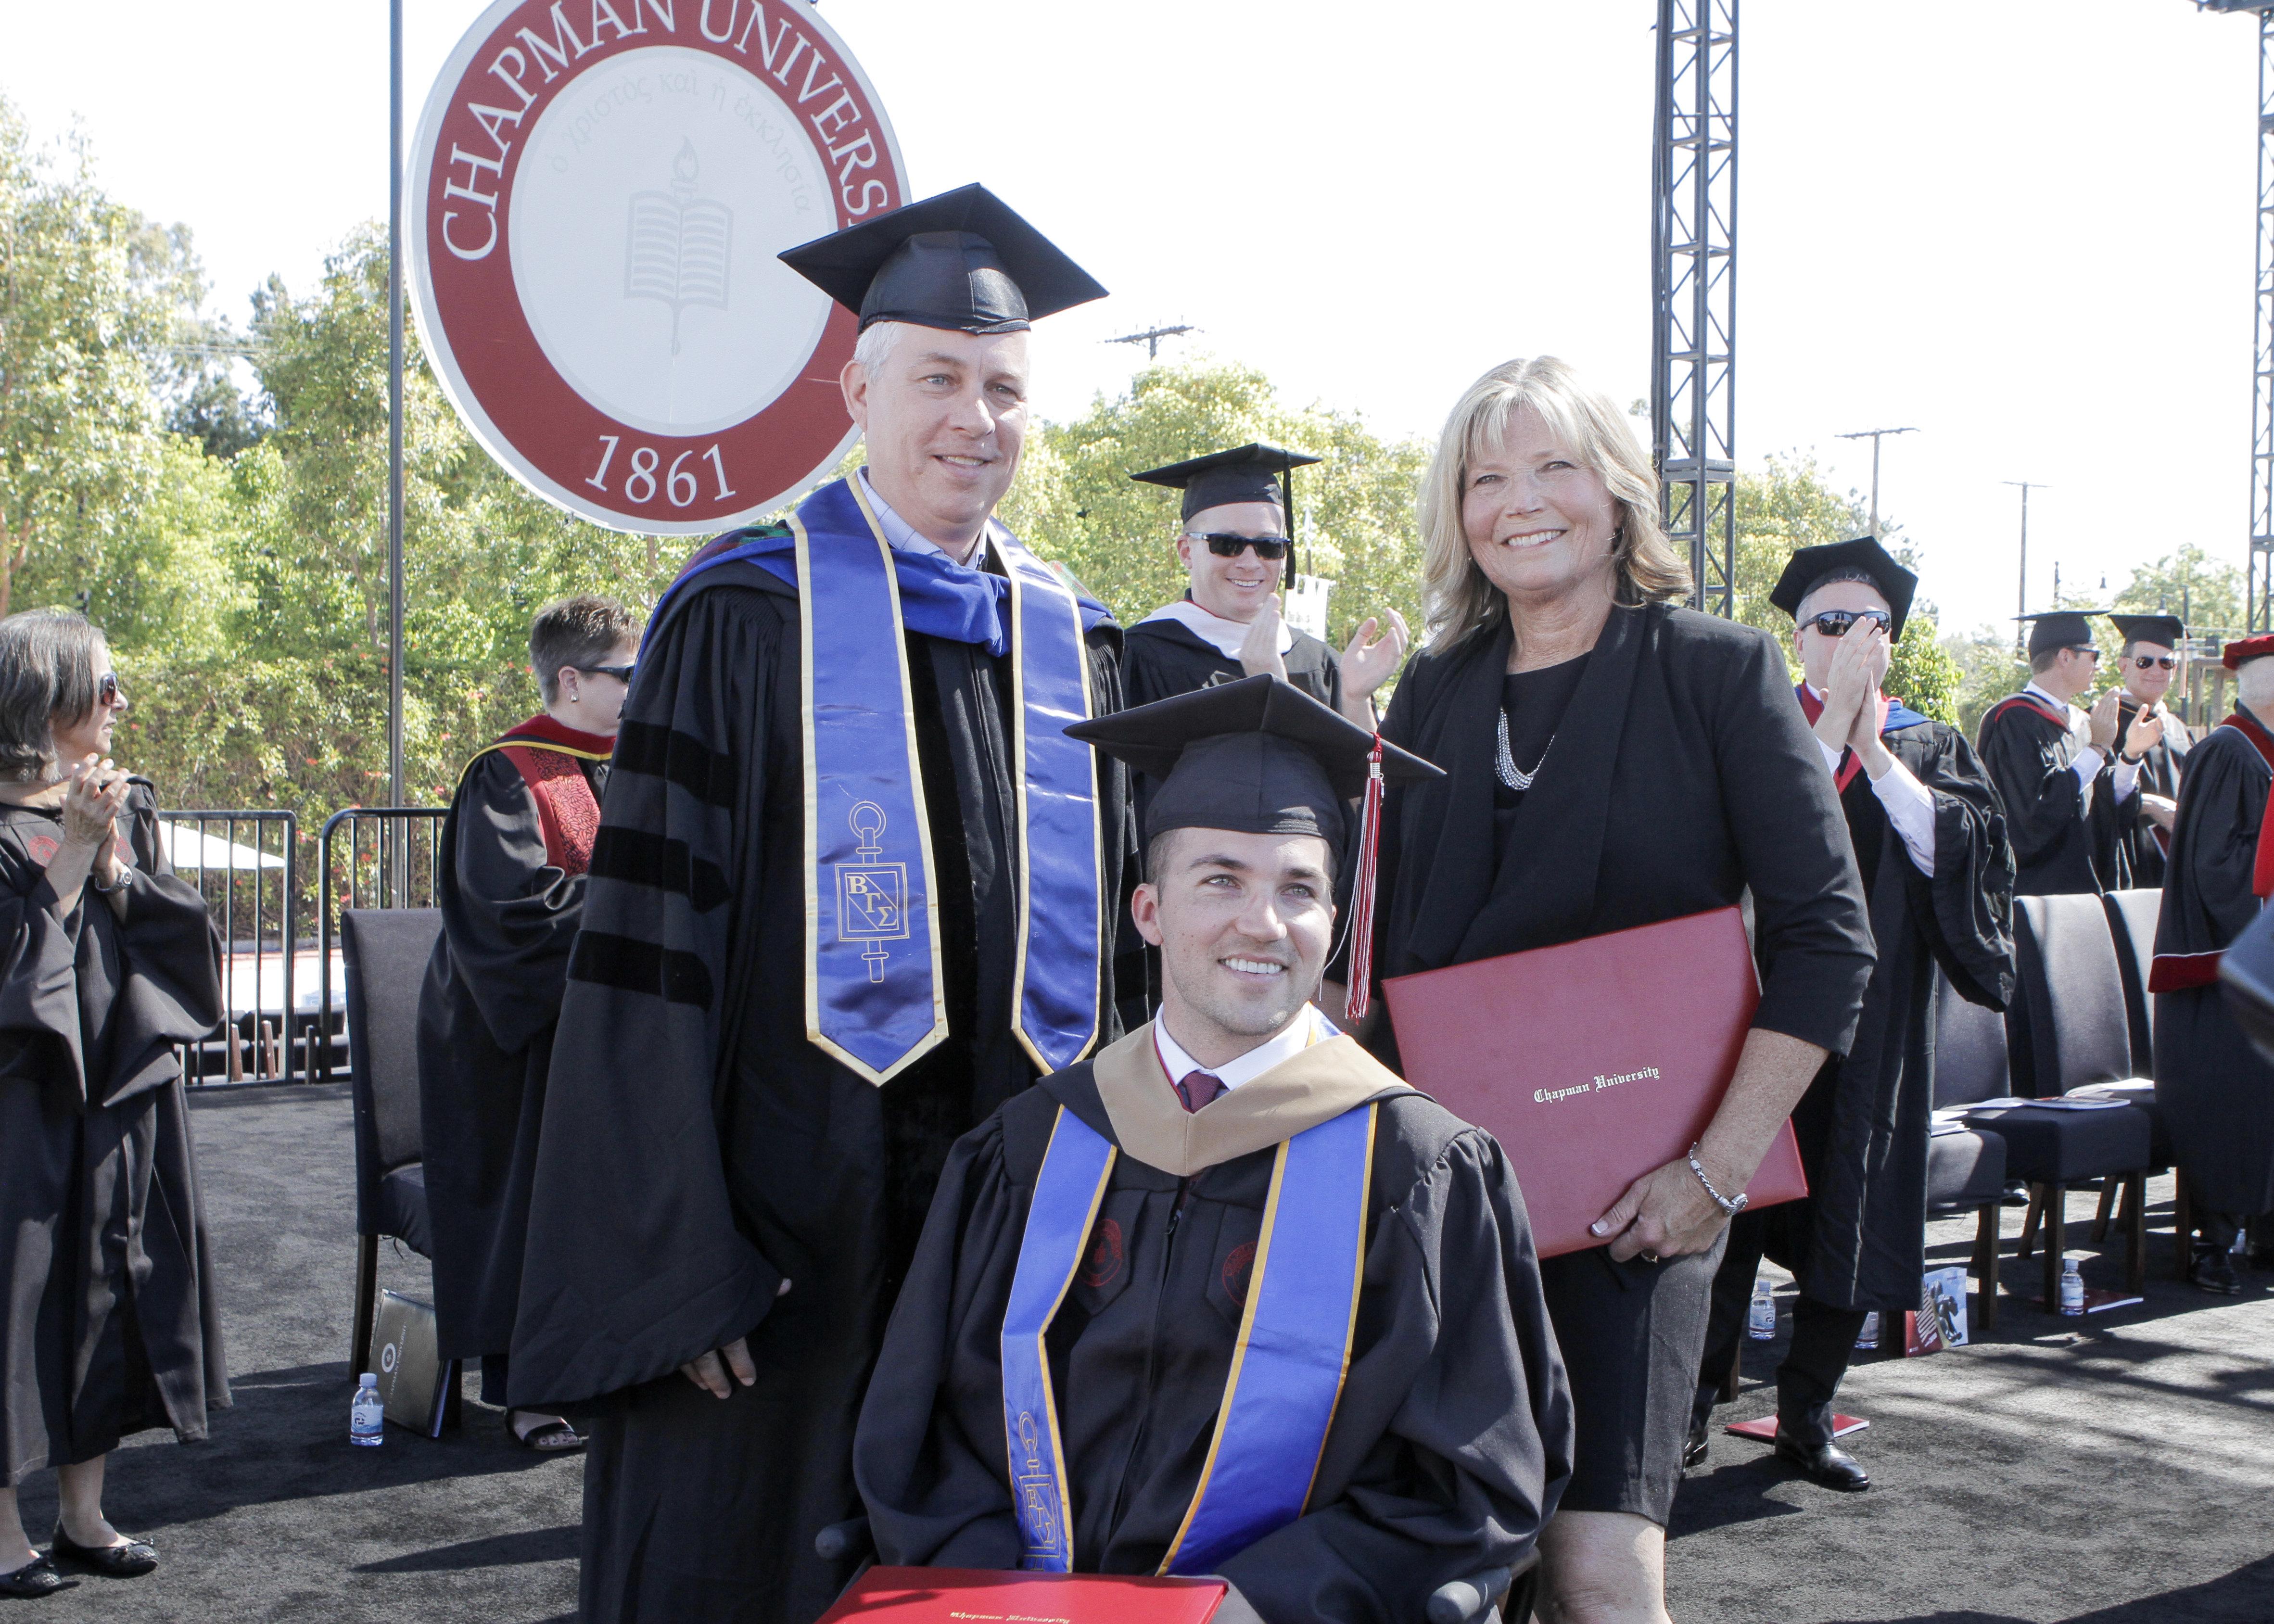 Mom Receives Honorary Degree After Helping Quadriplegic Son